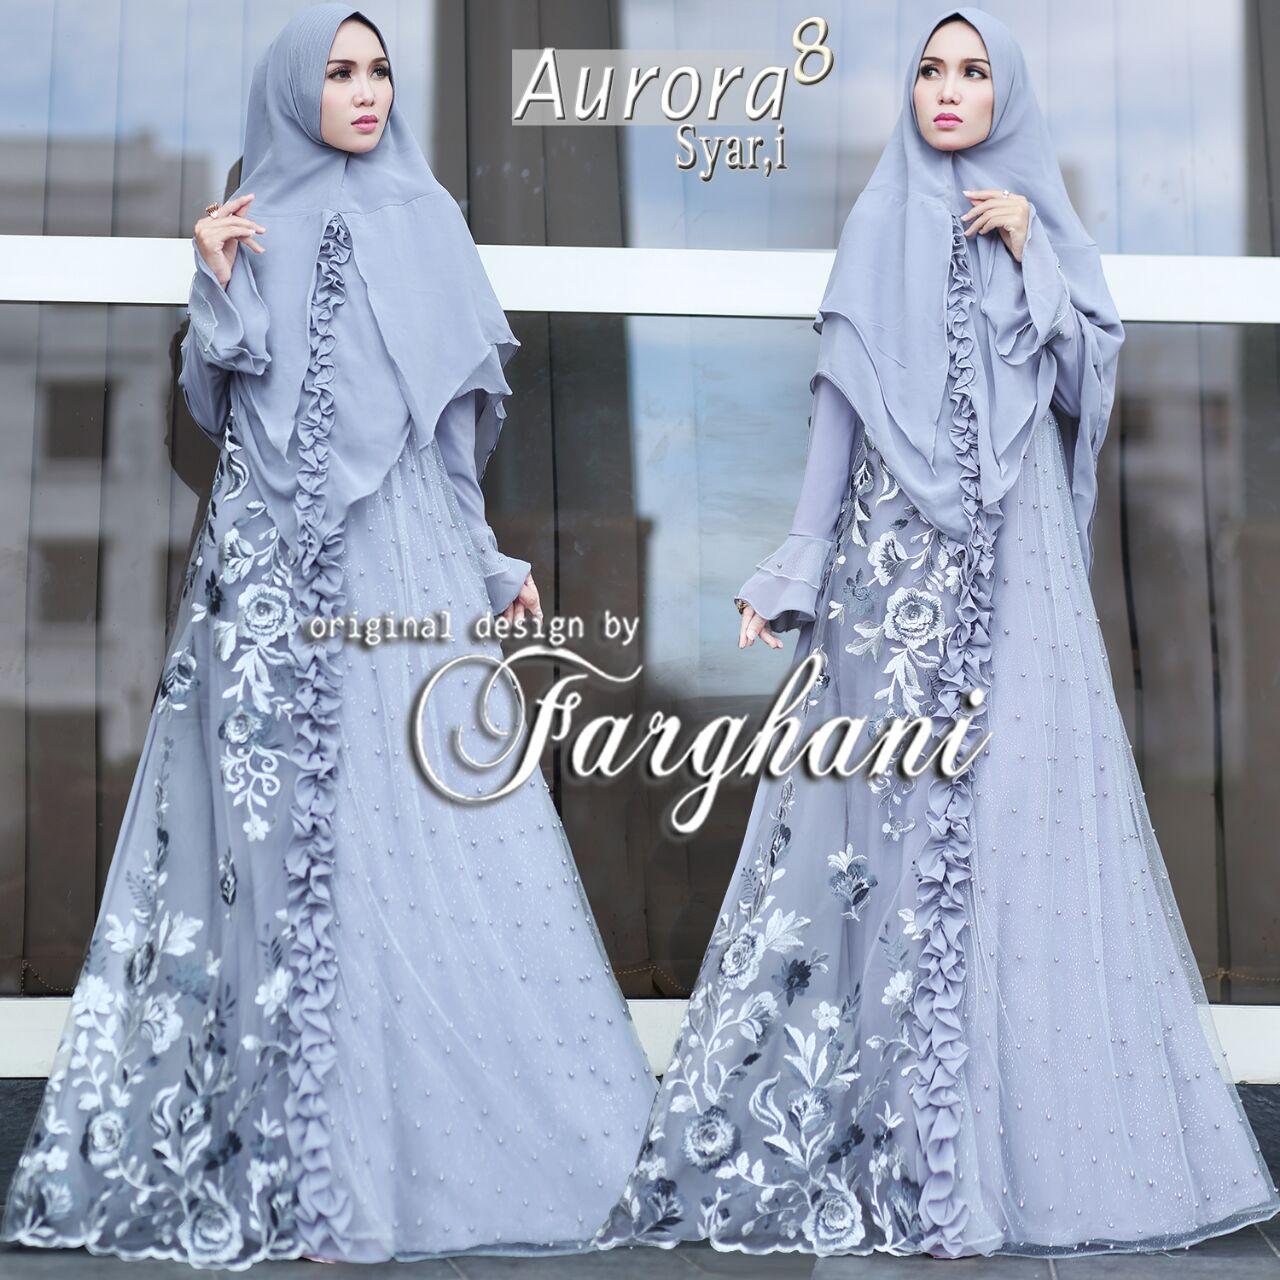 Aurora Long Skirt Warna Abu Referensi Daftar Harga Terbaru My Size Pants Pencil Abuaz492 Muda 3l 8 By Farghani